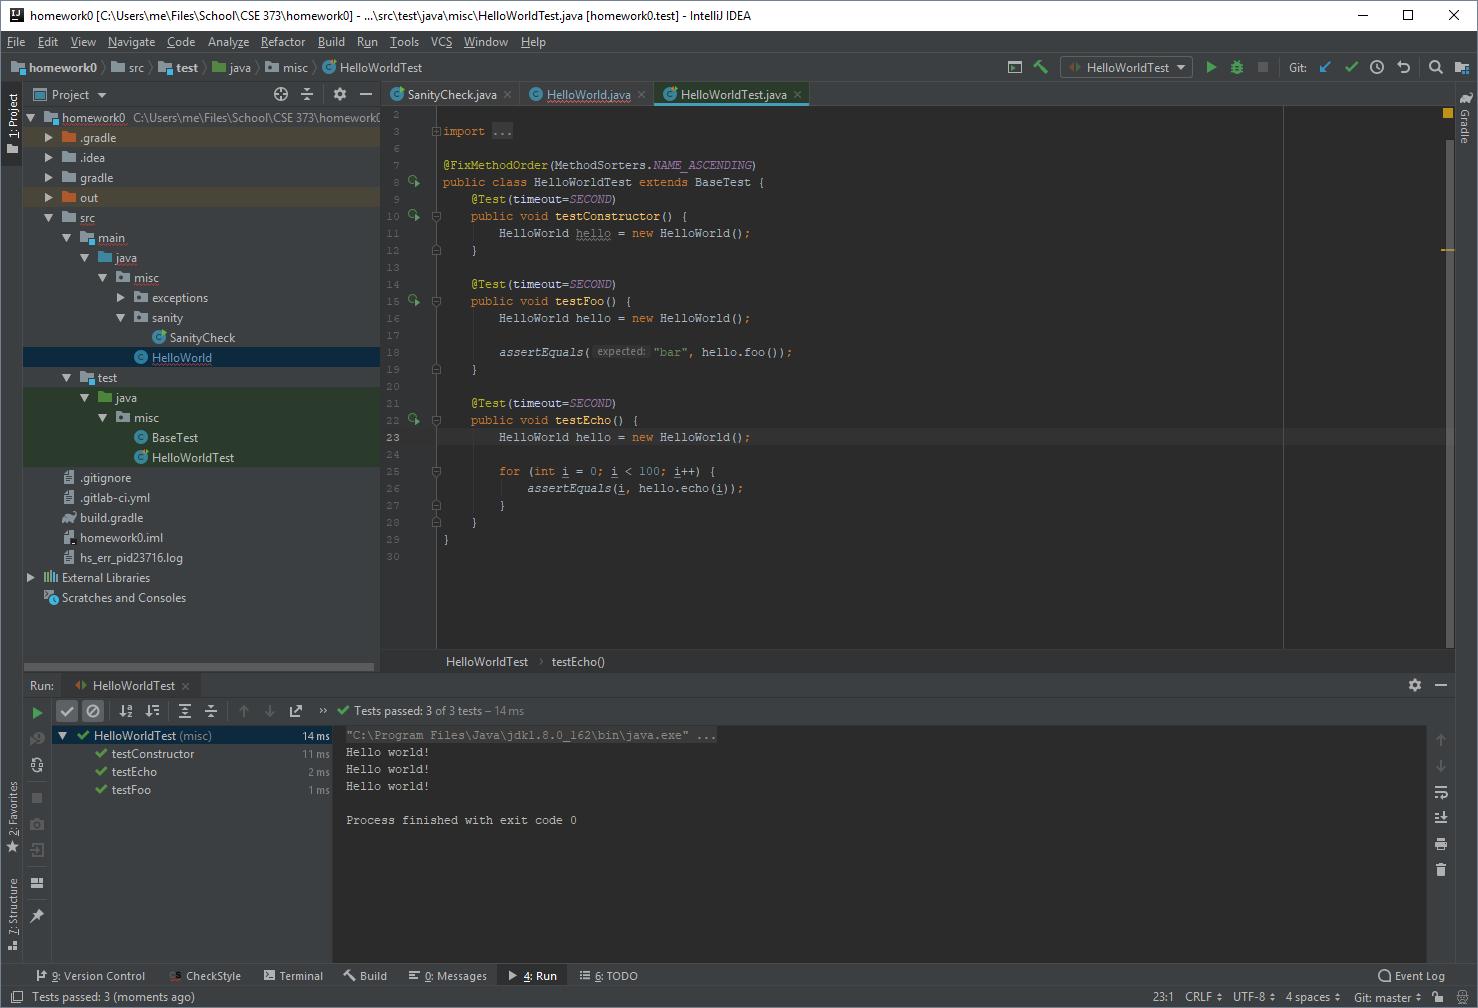 IntelliJ Interface Overview